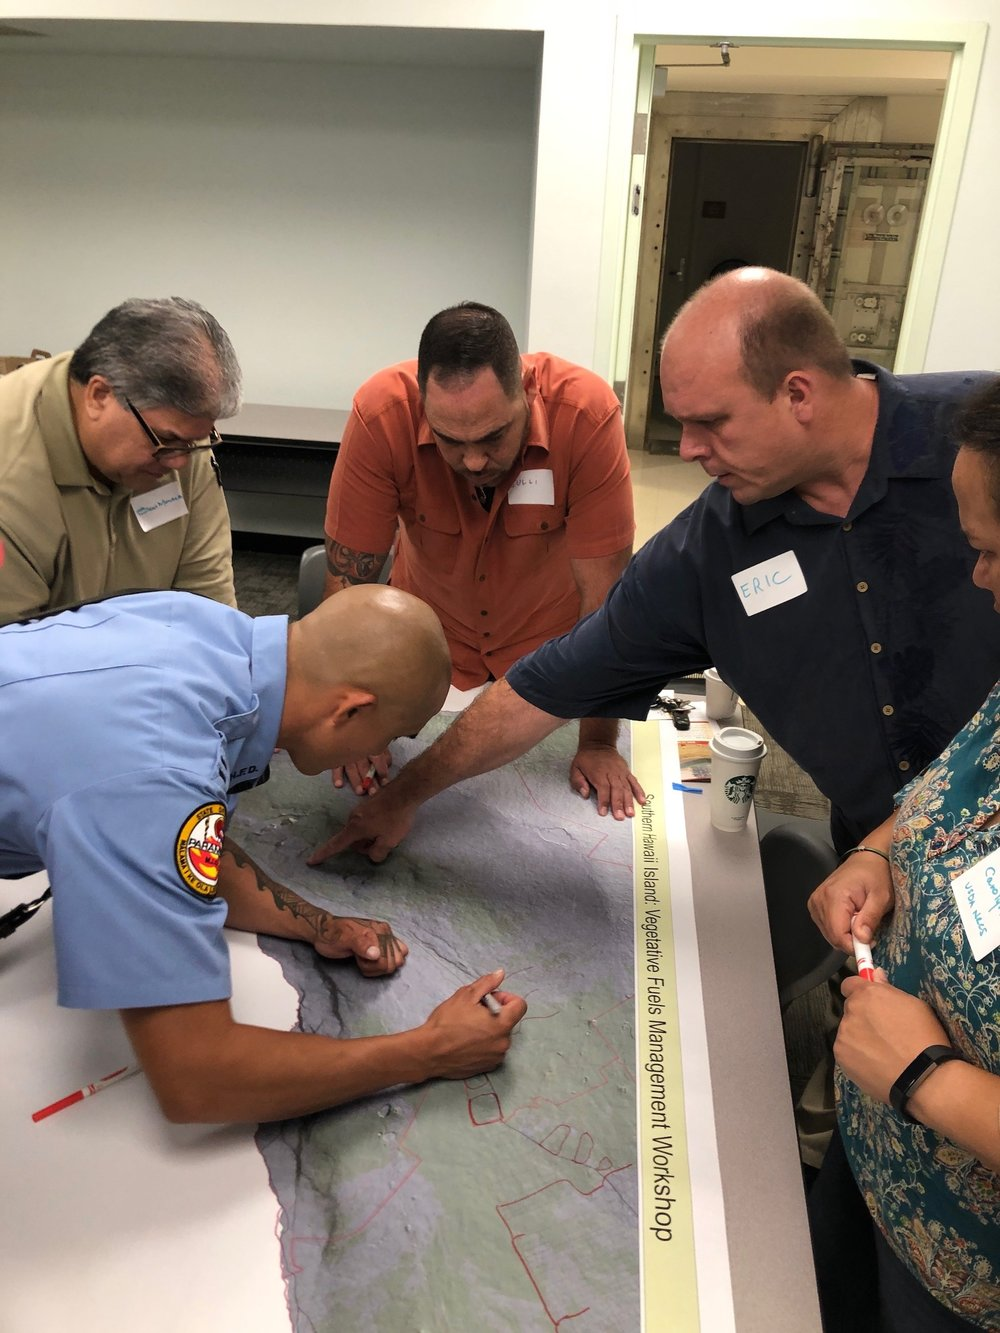 Hawaii Island Hilo Vegetative Fuels Management Collaborative Action Planning Workshop_2_22_2019_6.jpg